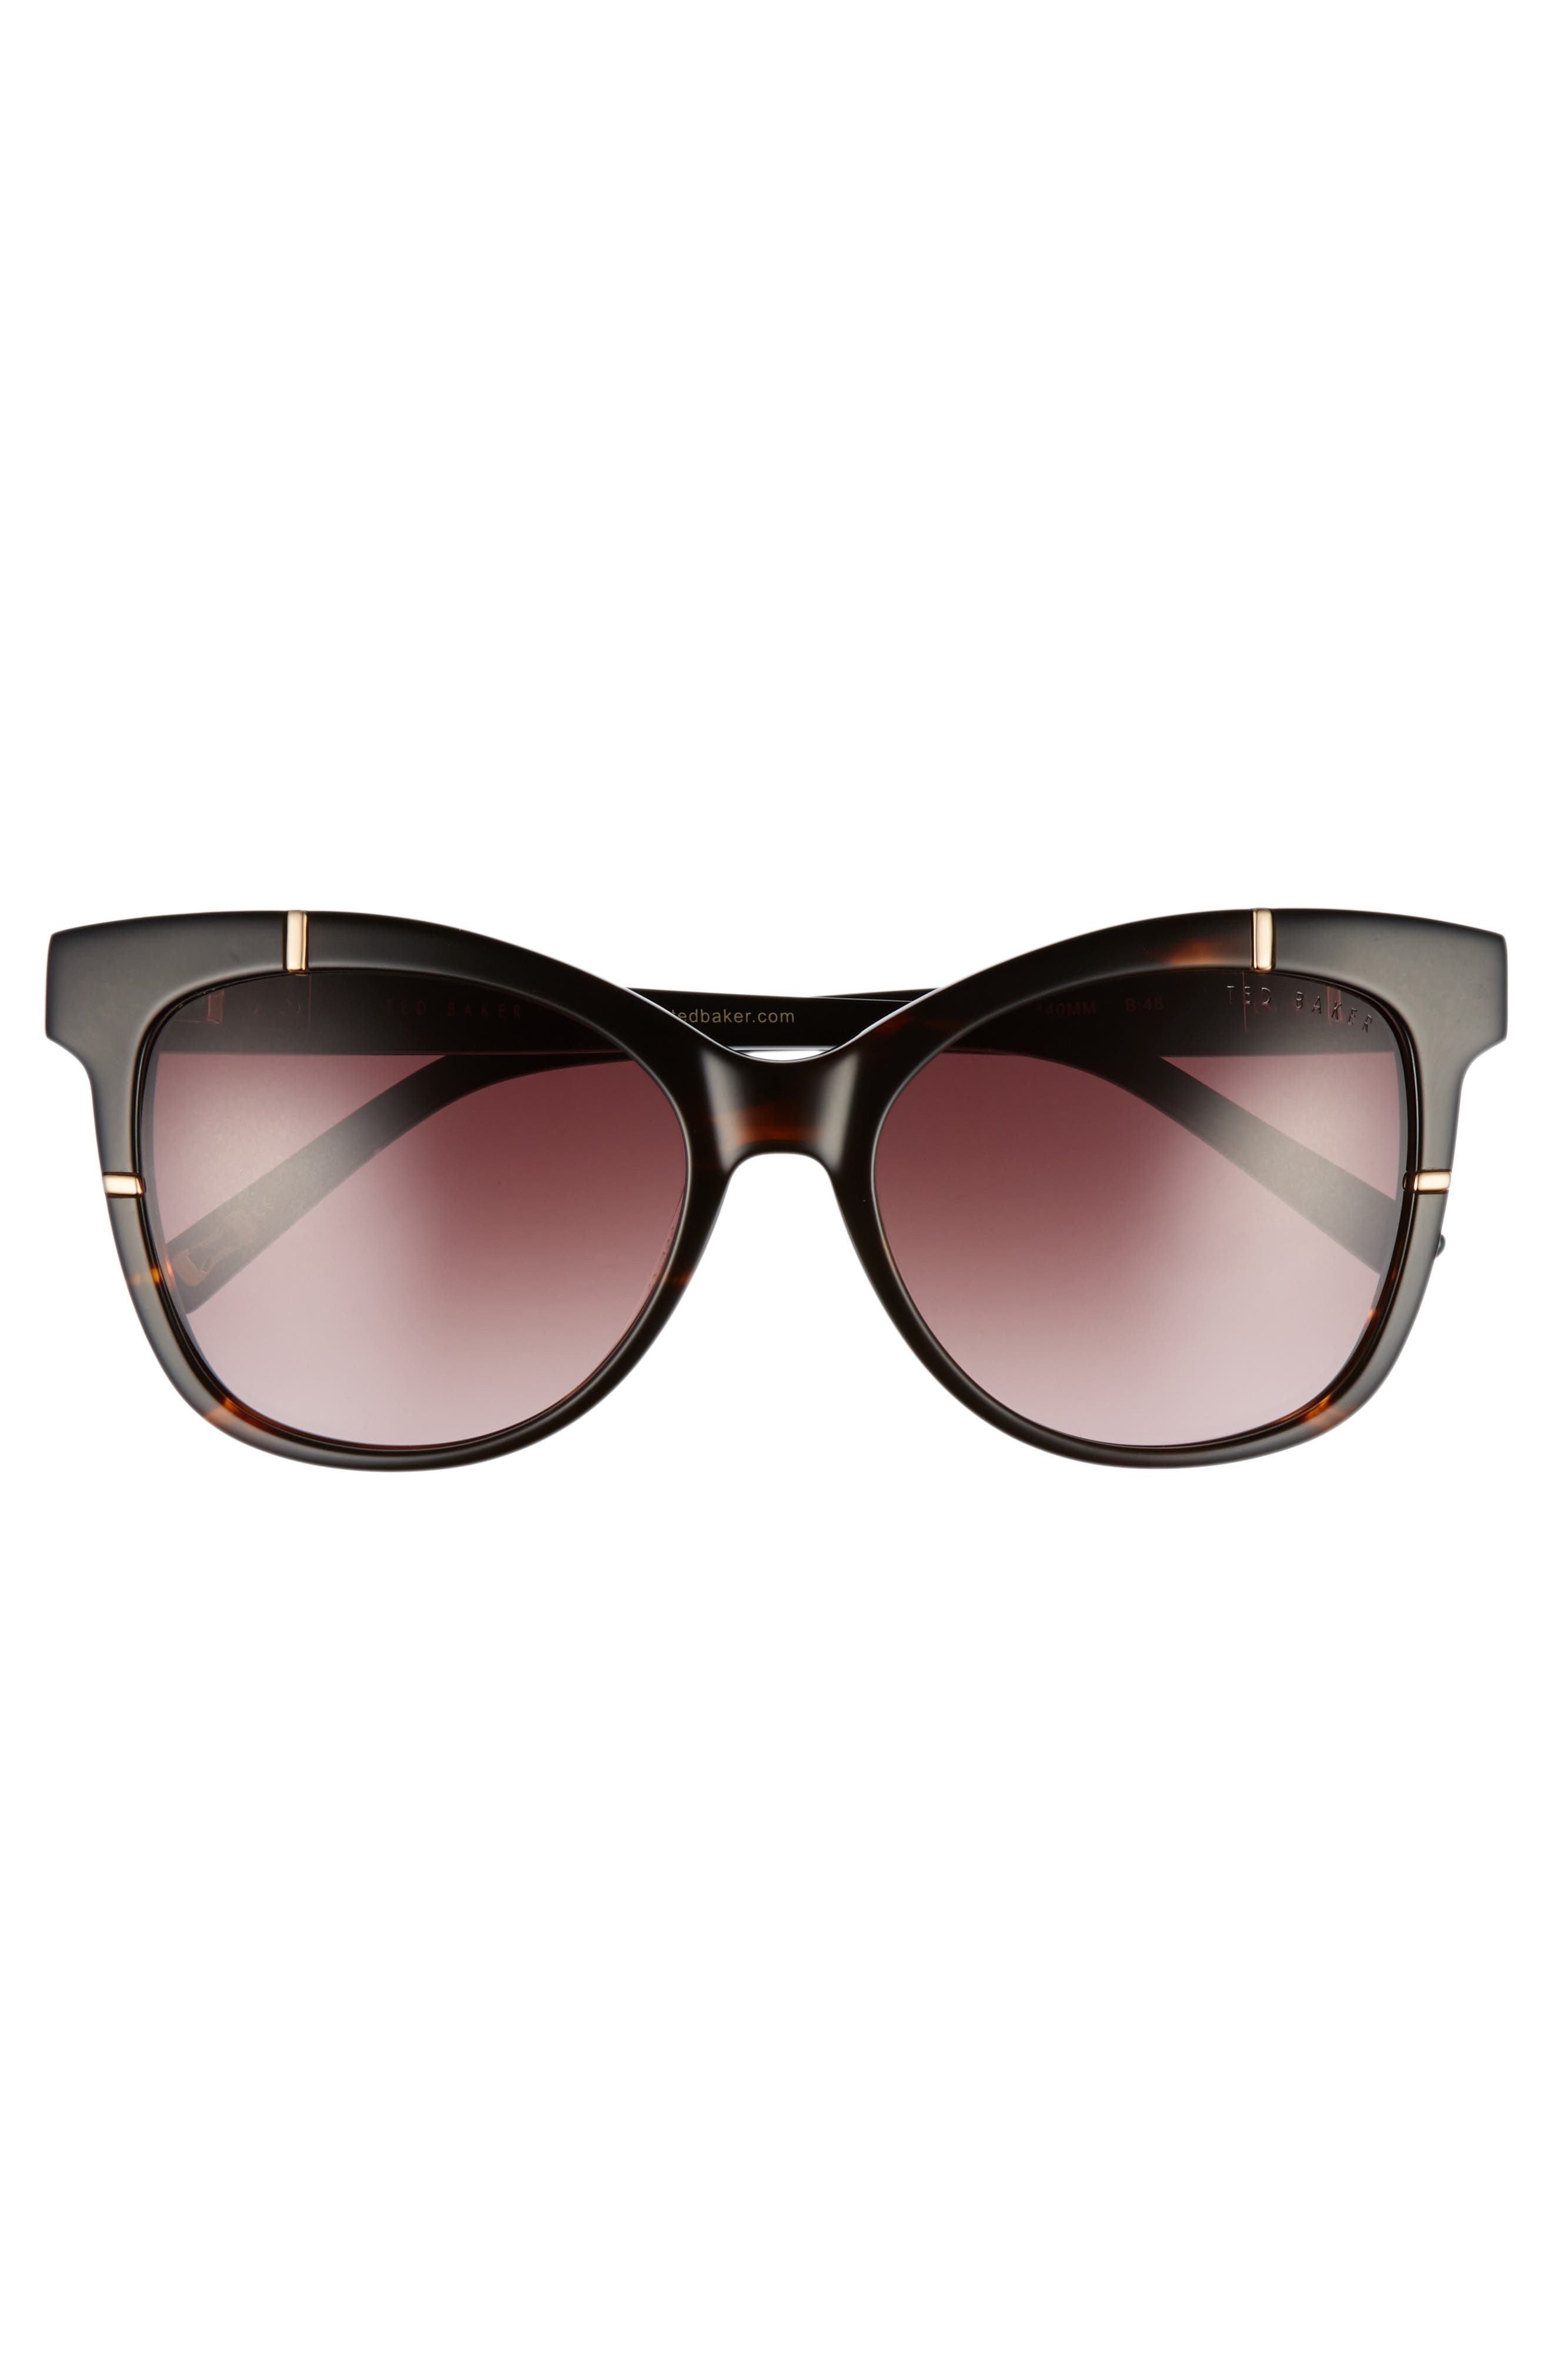 55mm Square Cat Eye Sunglasses,                             Alternate thumbnail 3, color,                             TORTOISE